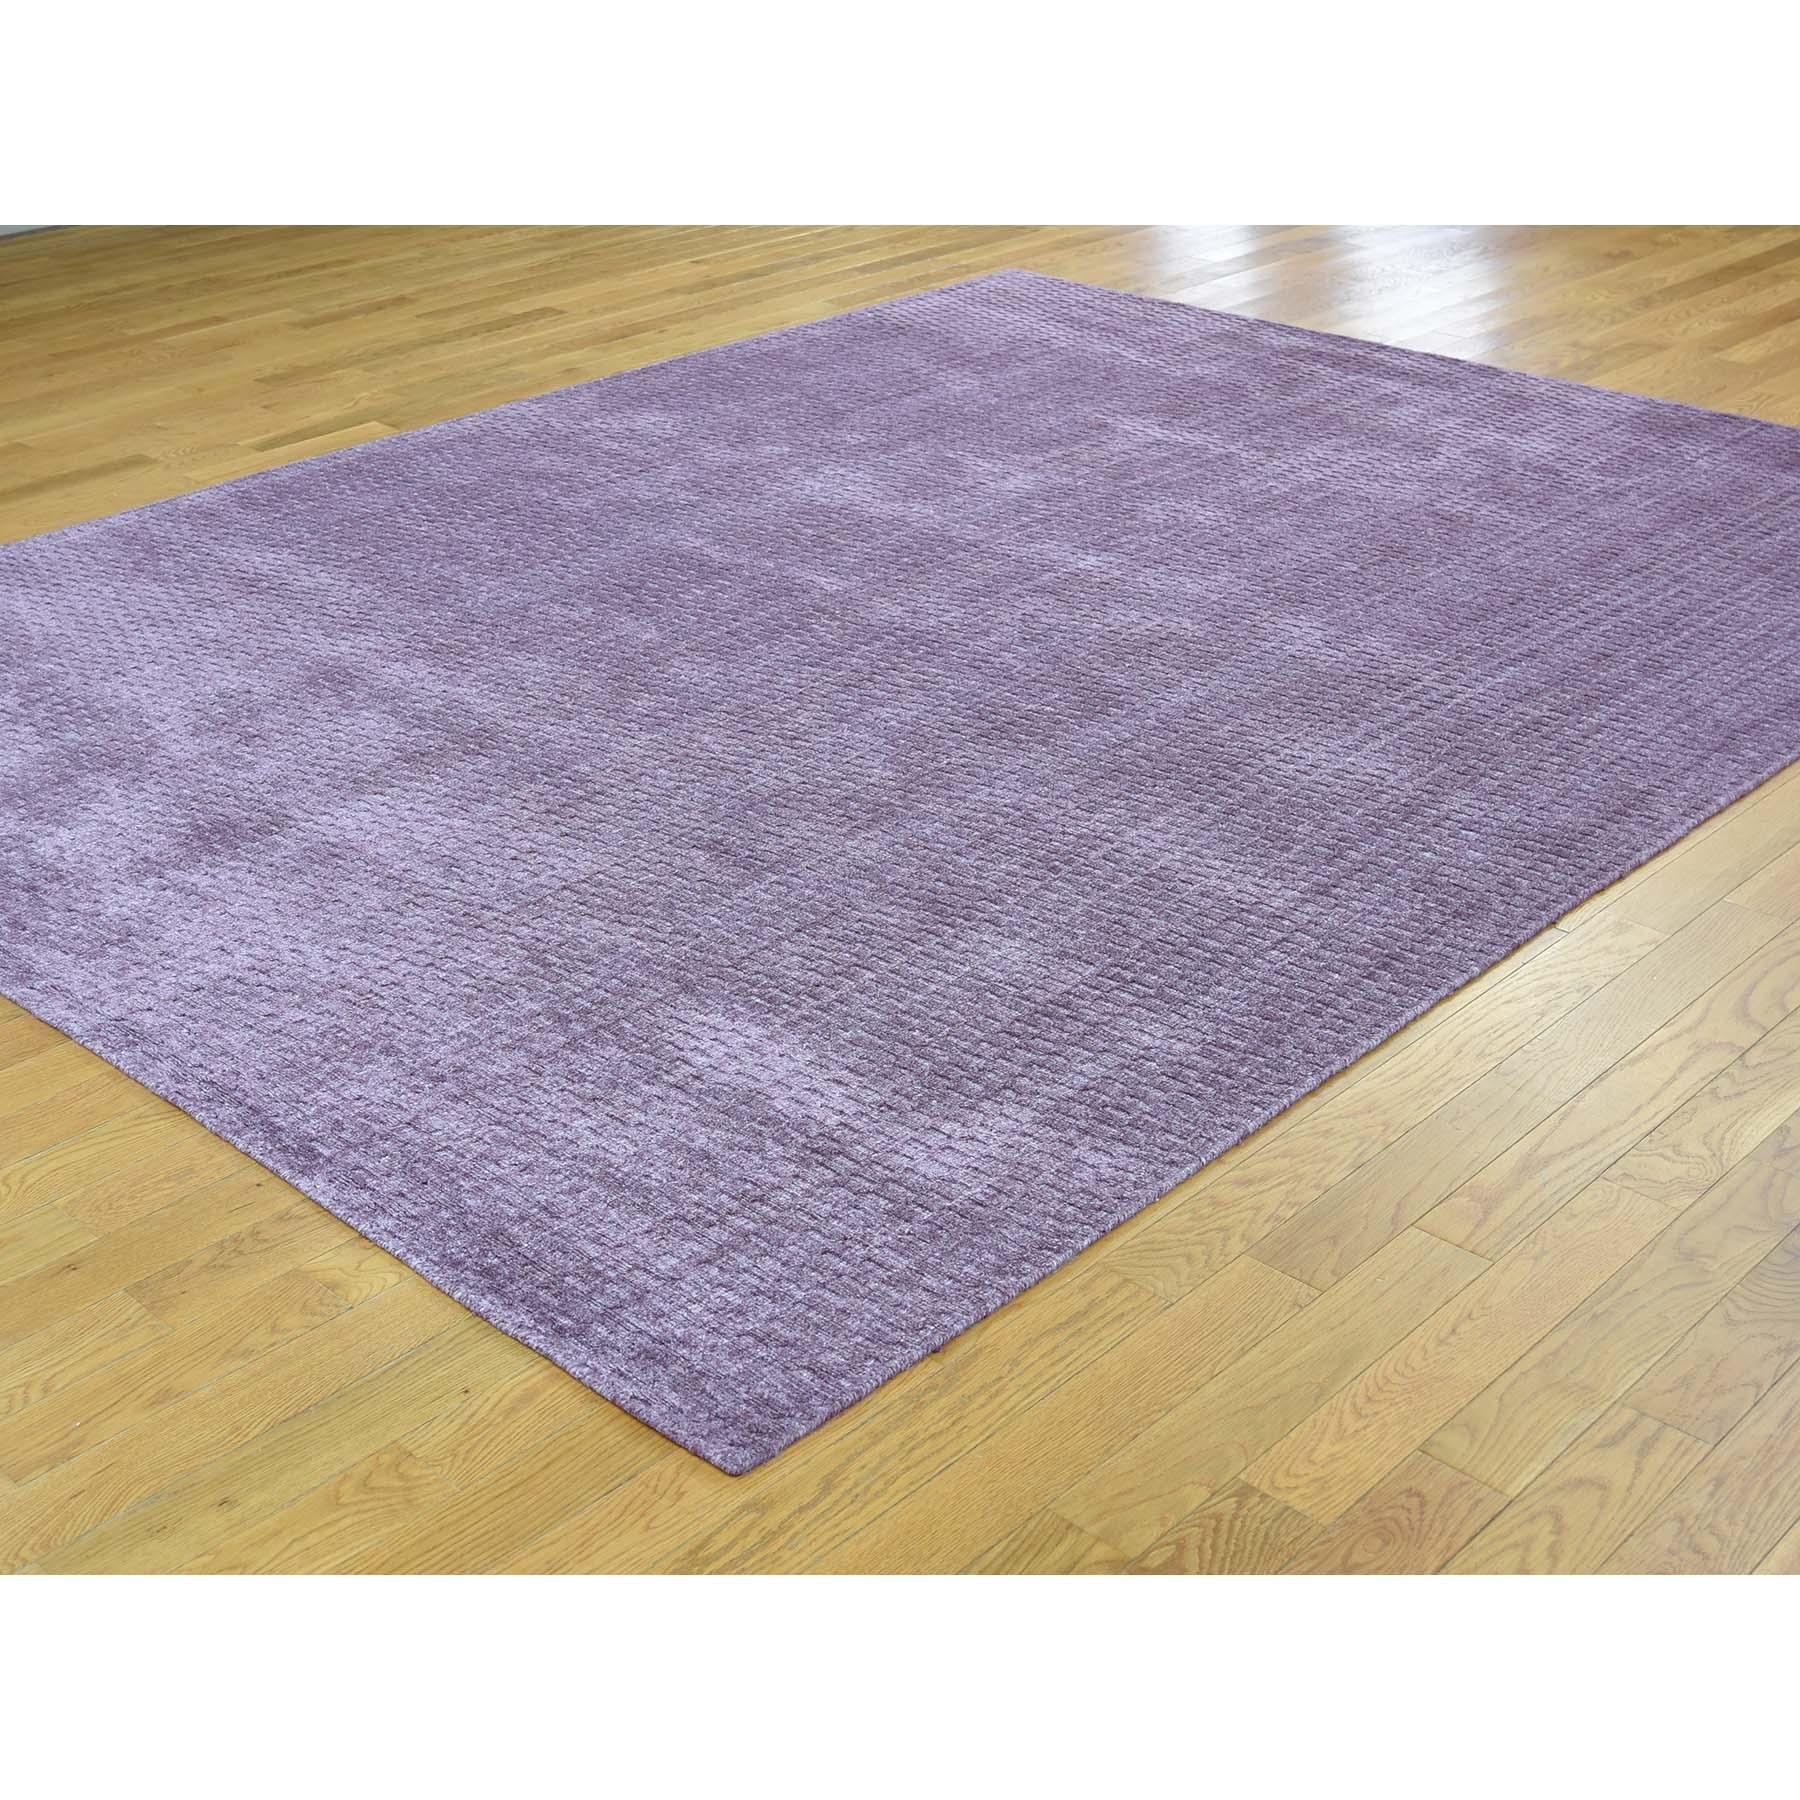 8-x10-1  Hand Loomed Pure Wool Tone on Tone Oriental Rug